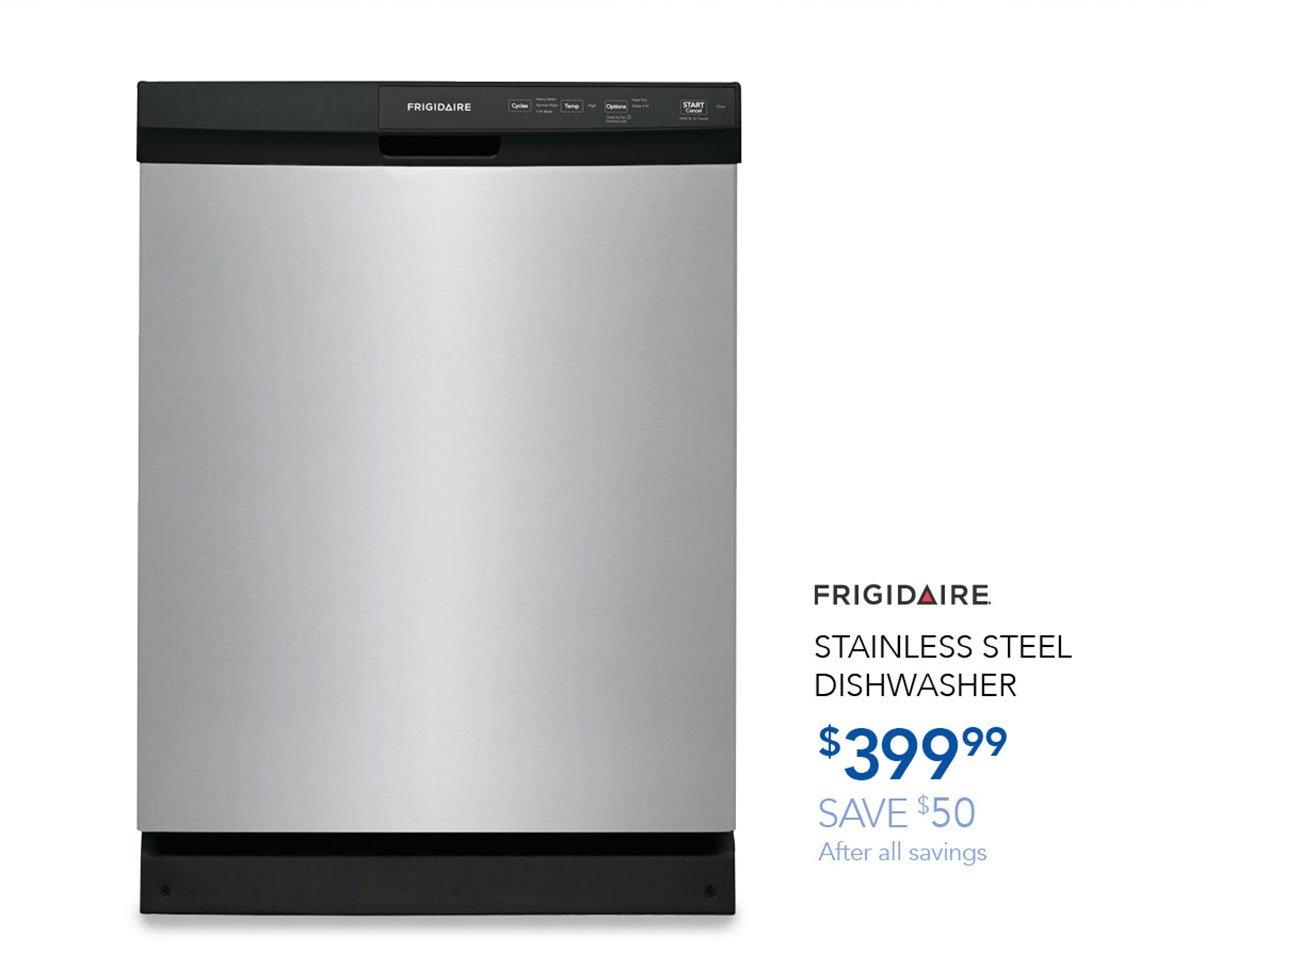 Frigidaire-stainless-steel-dishwasher